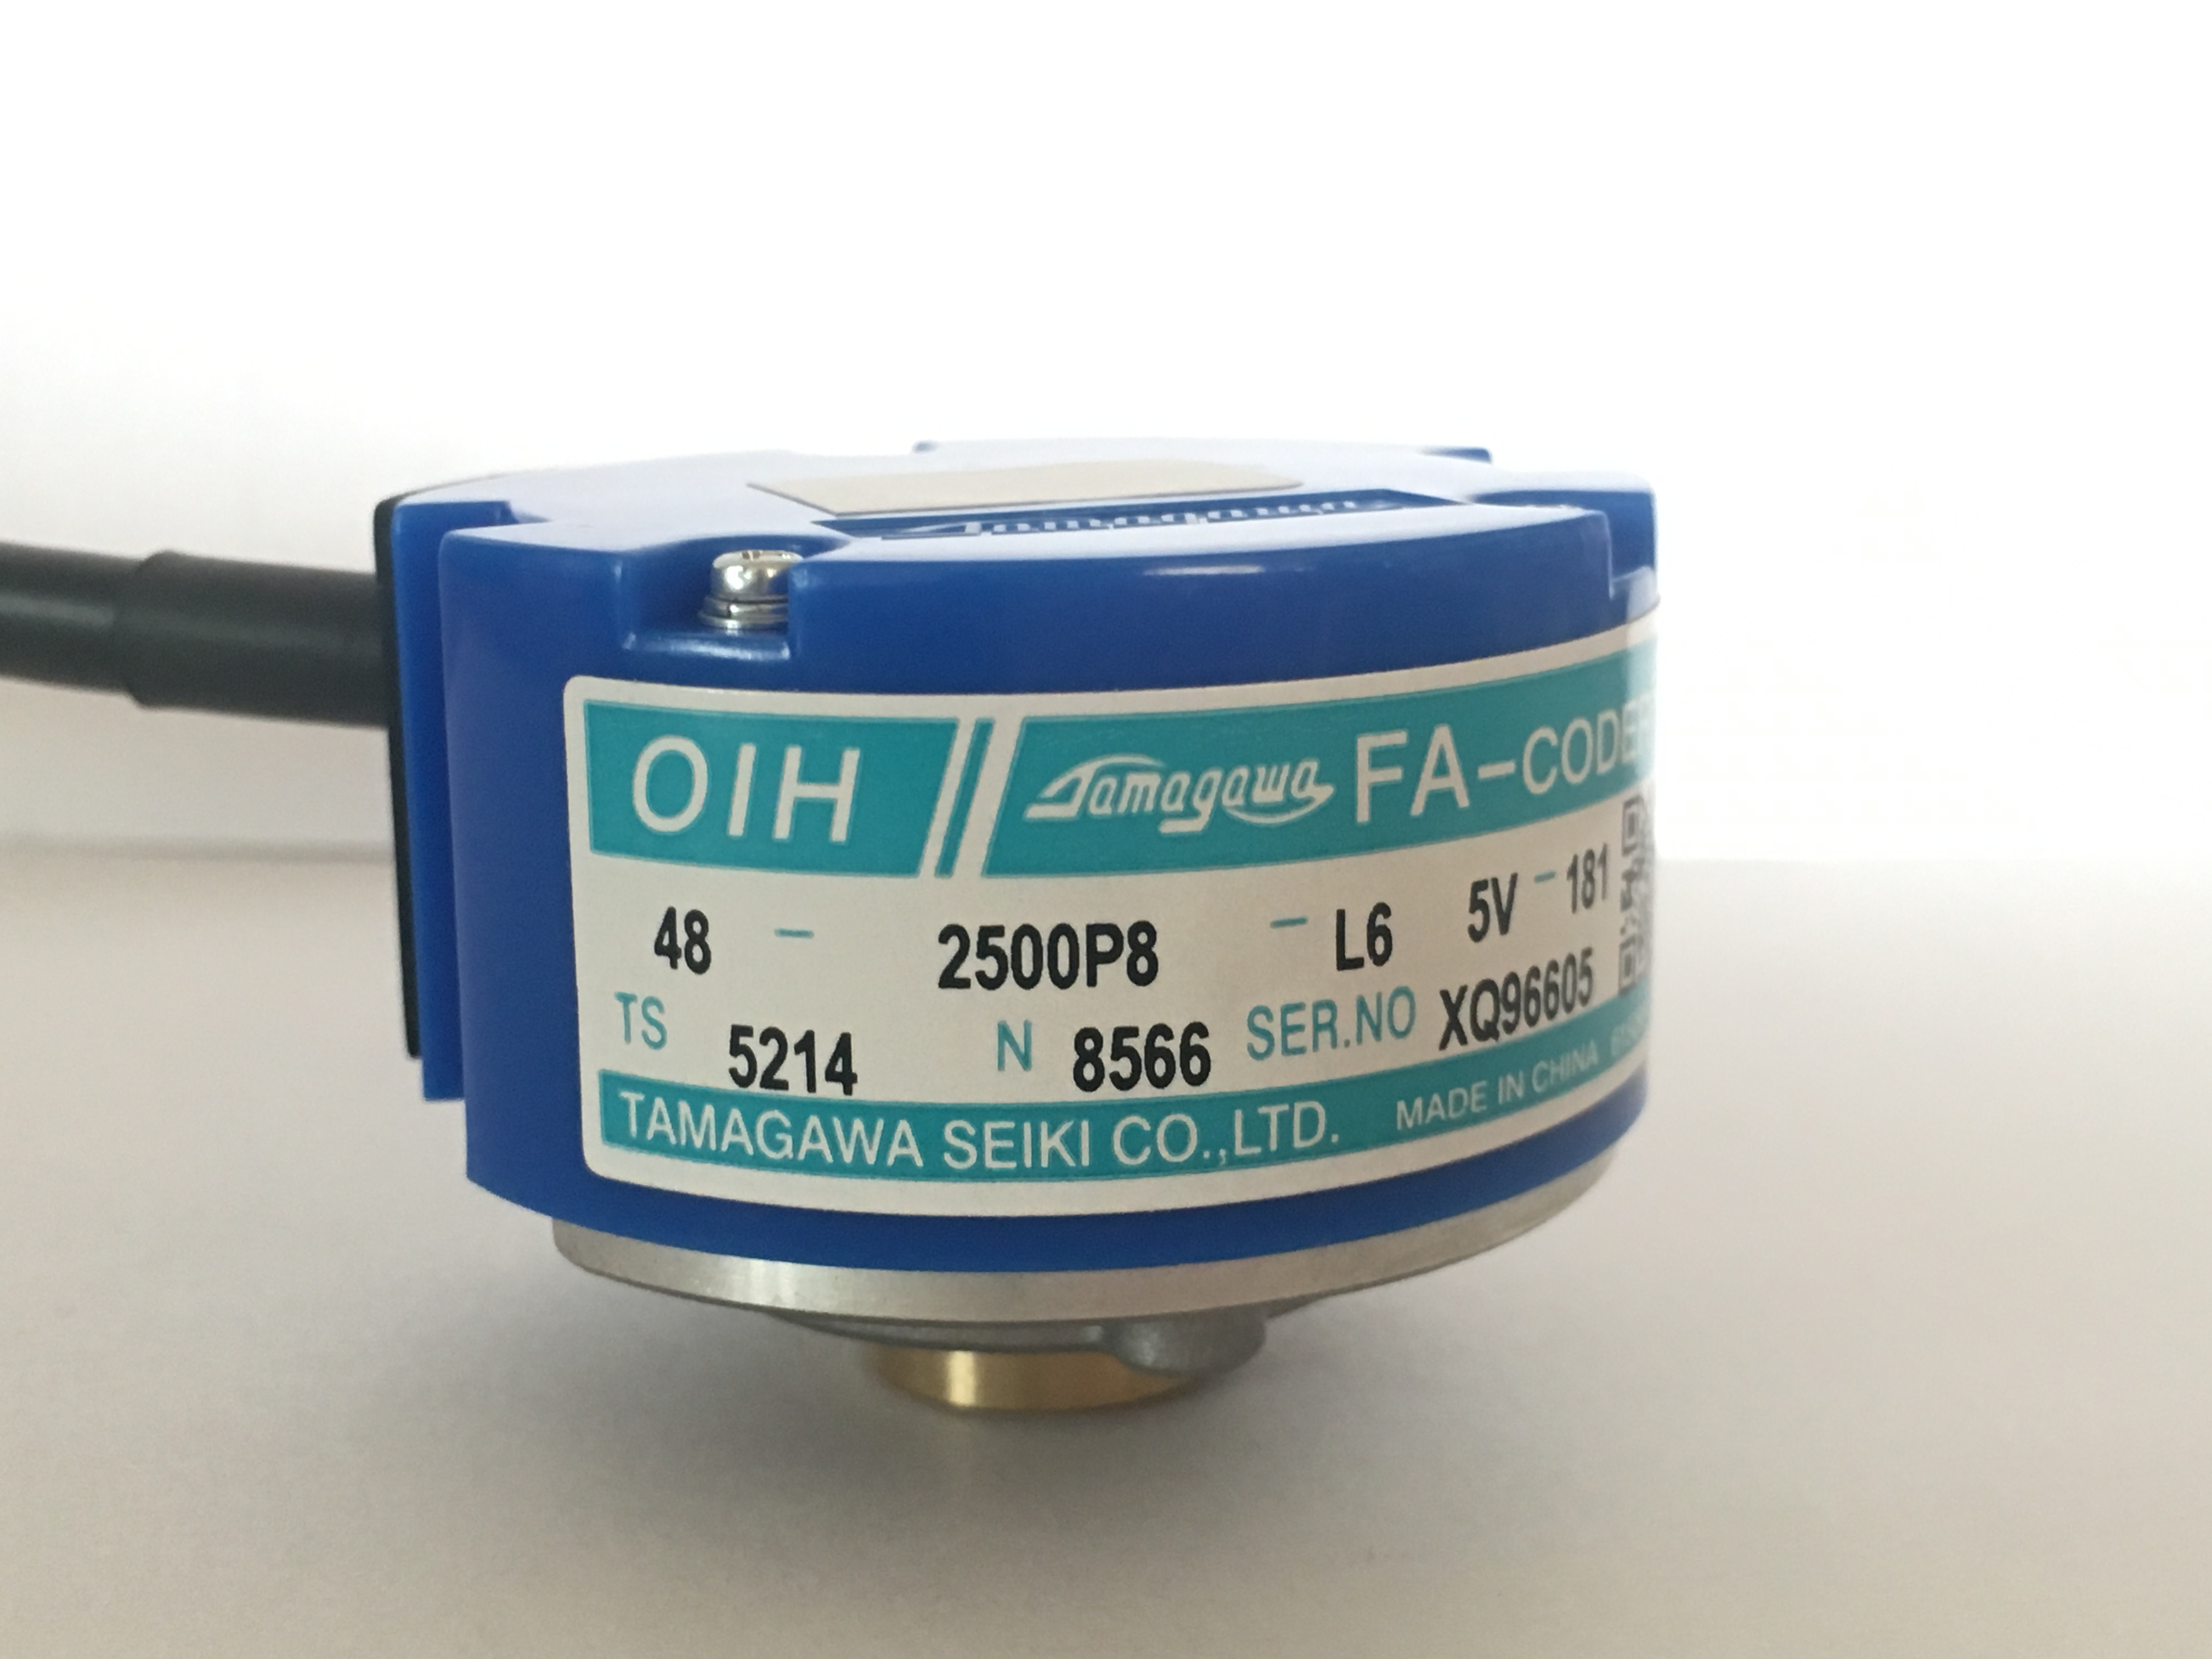 TS5214N8566/566 original Tama Chuan servo motor encoder OIH48-2500P8-L6-5V цены онлайн